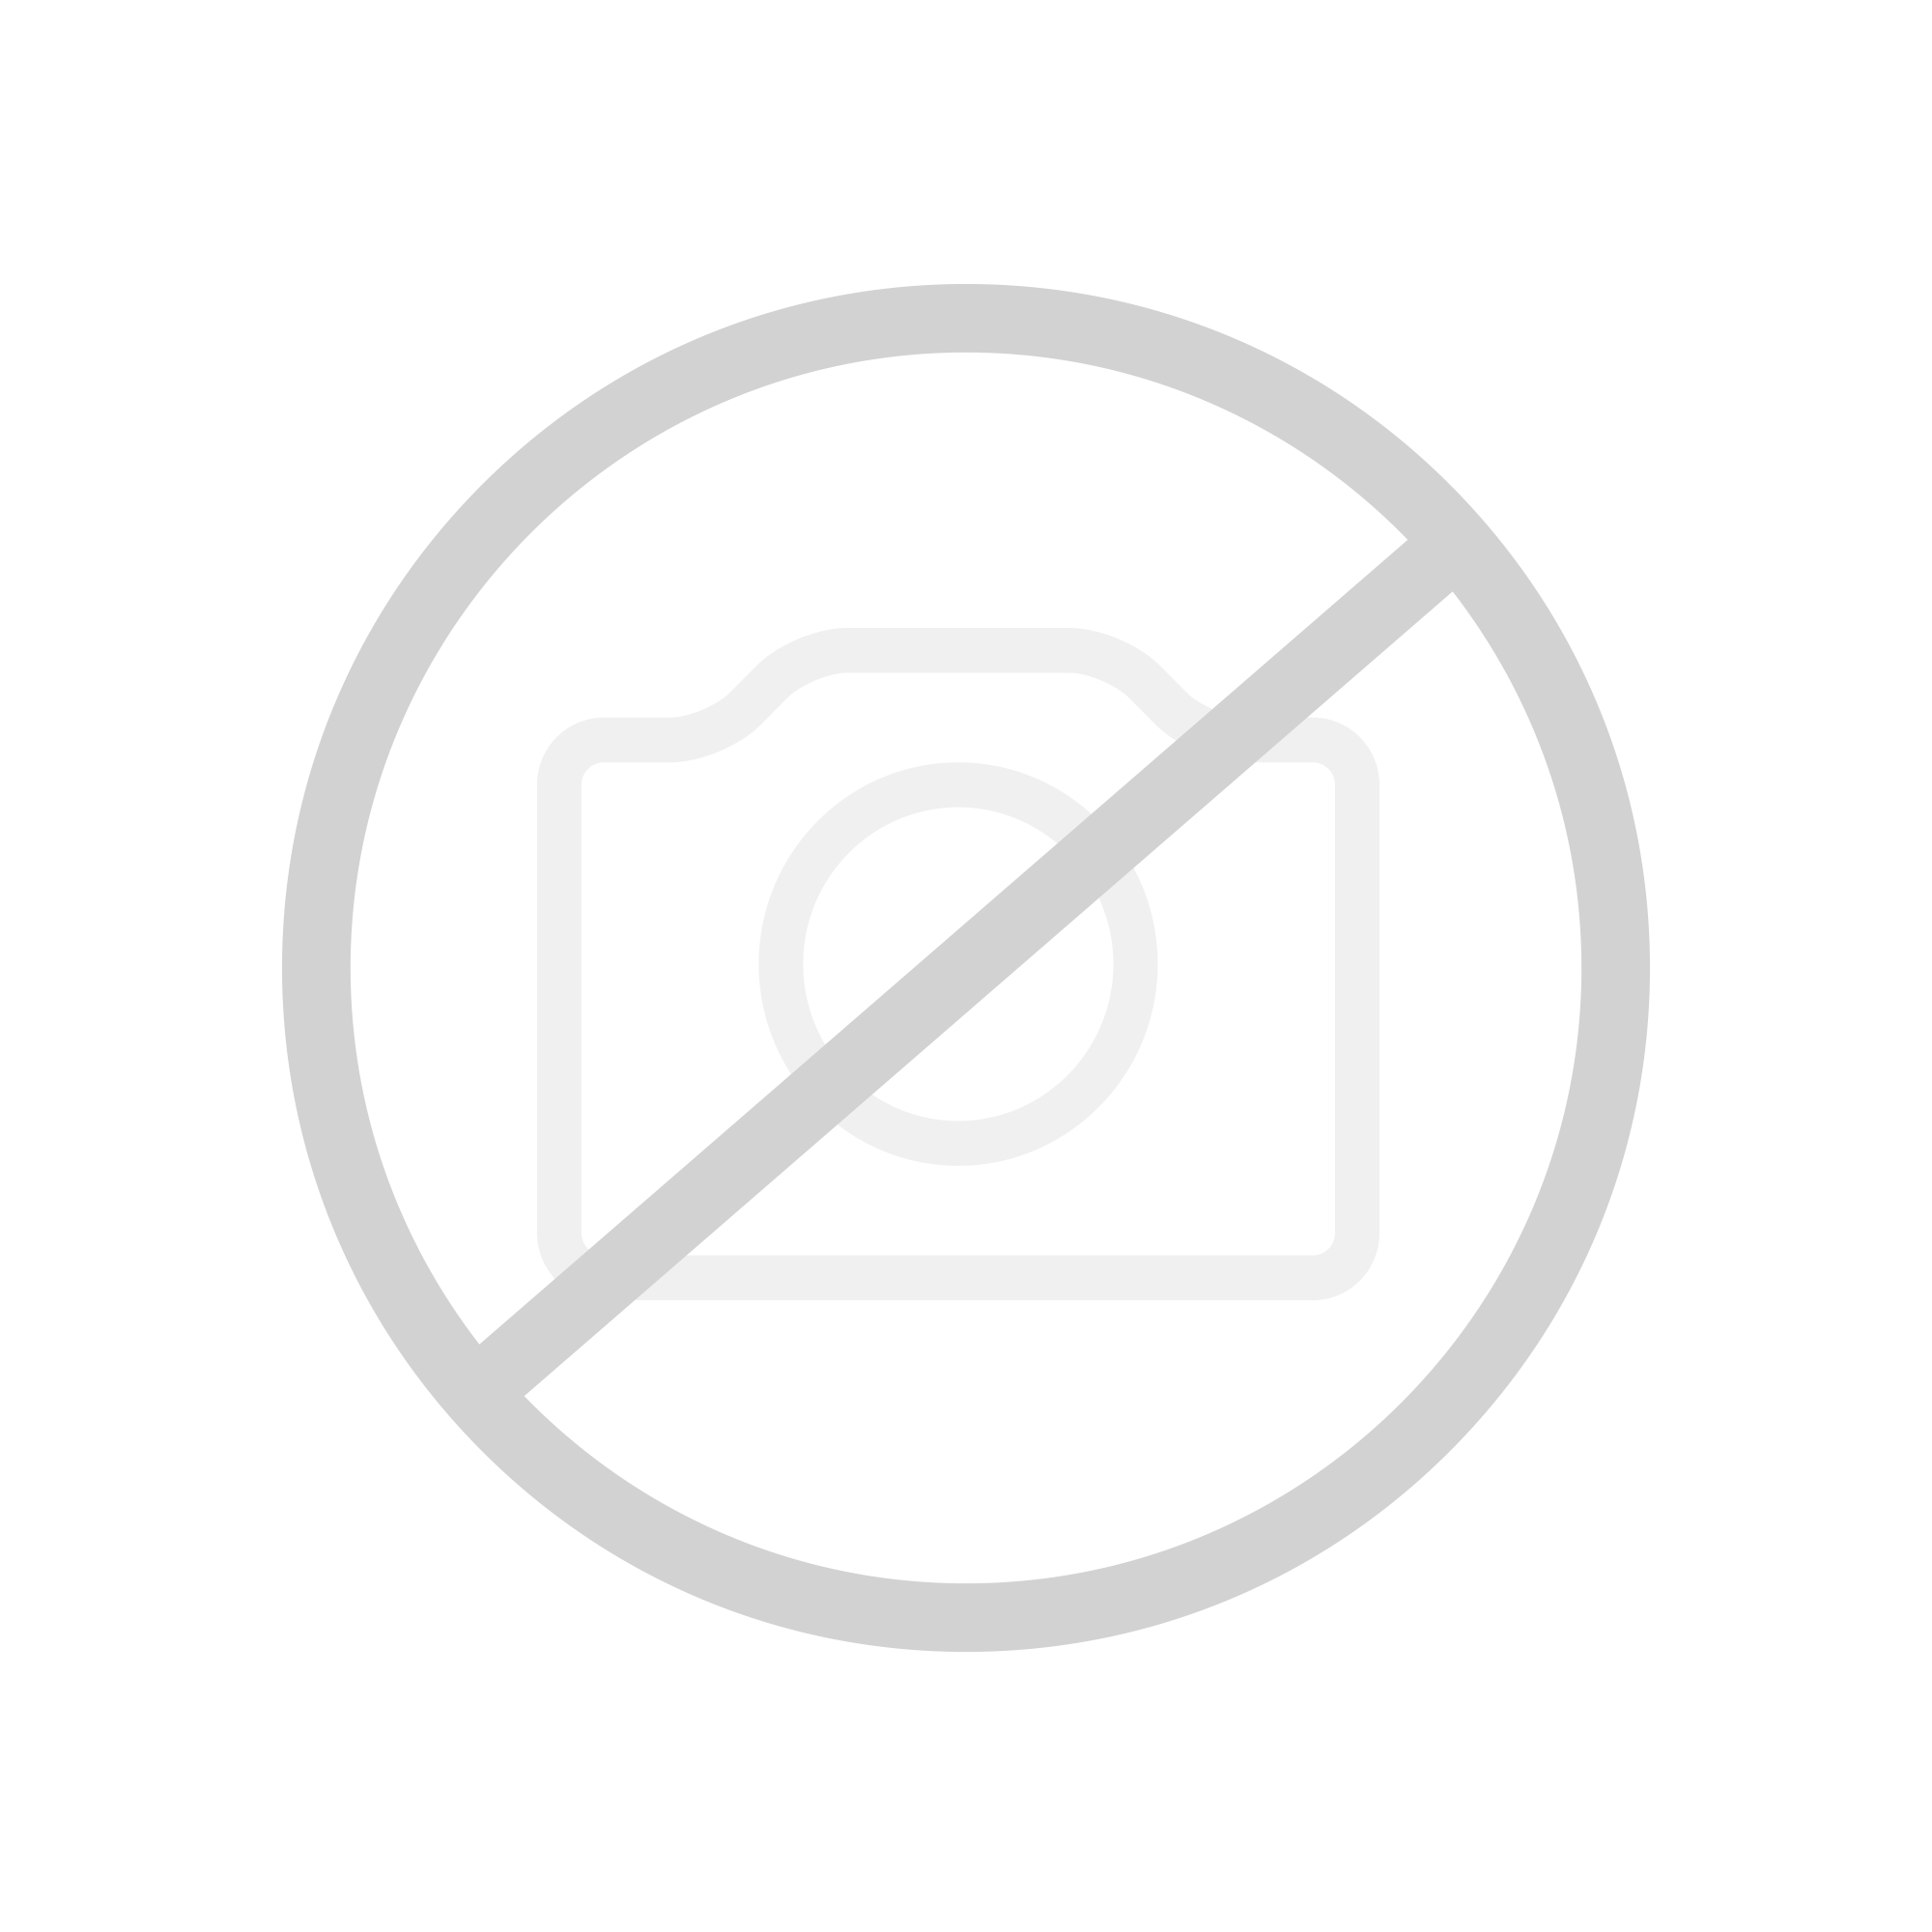 louis poulsen PH 3 ½-2 ½ Stehleuchte